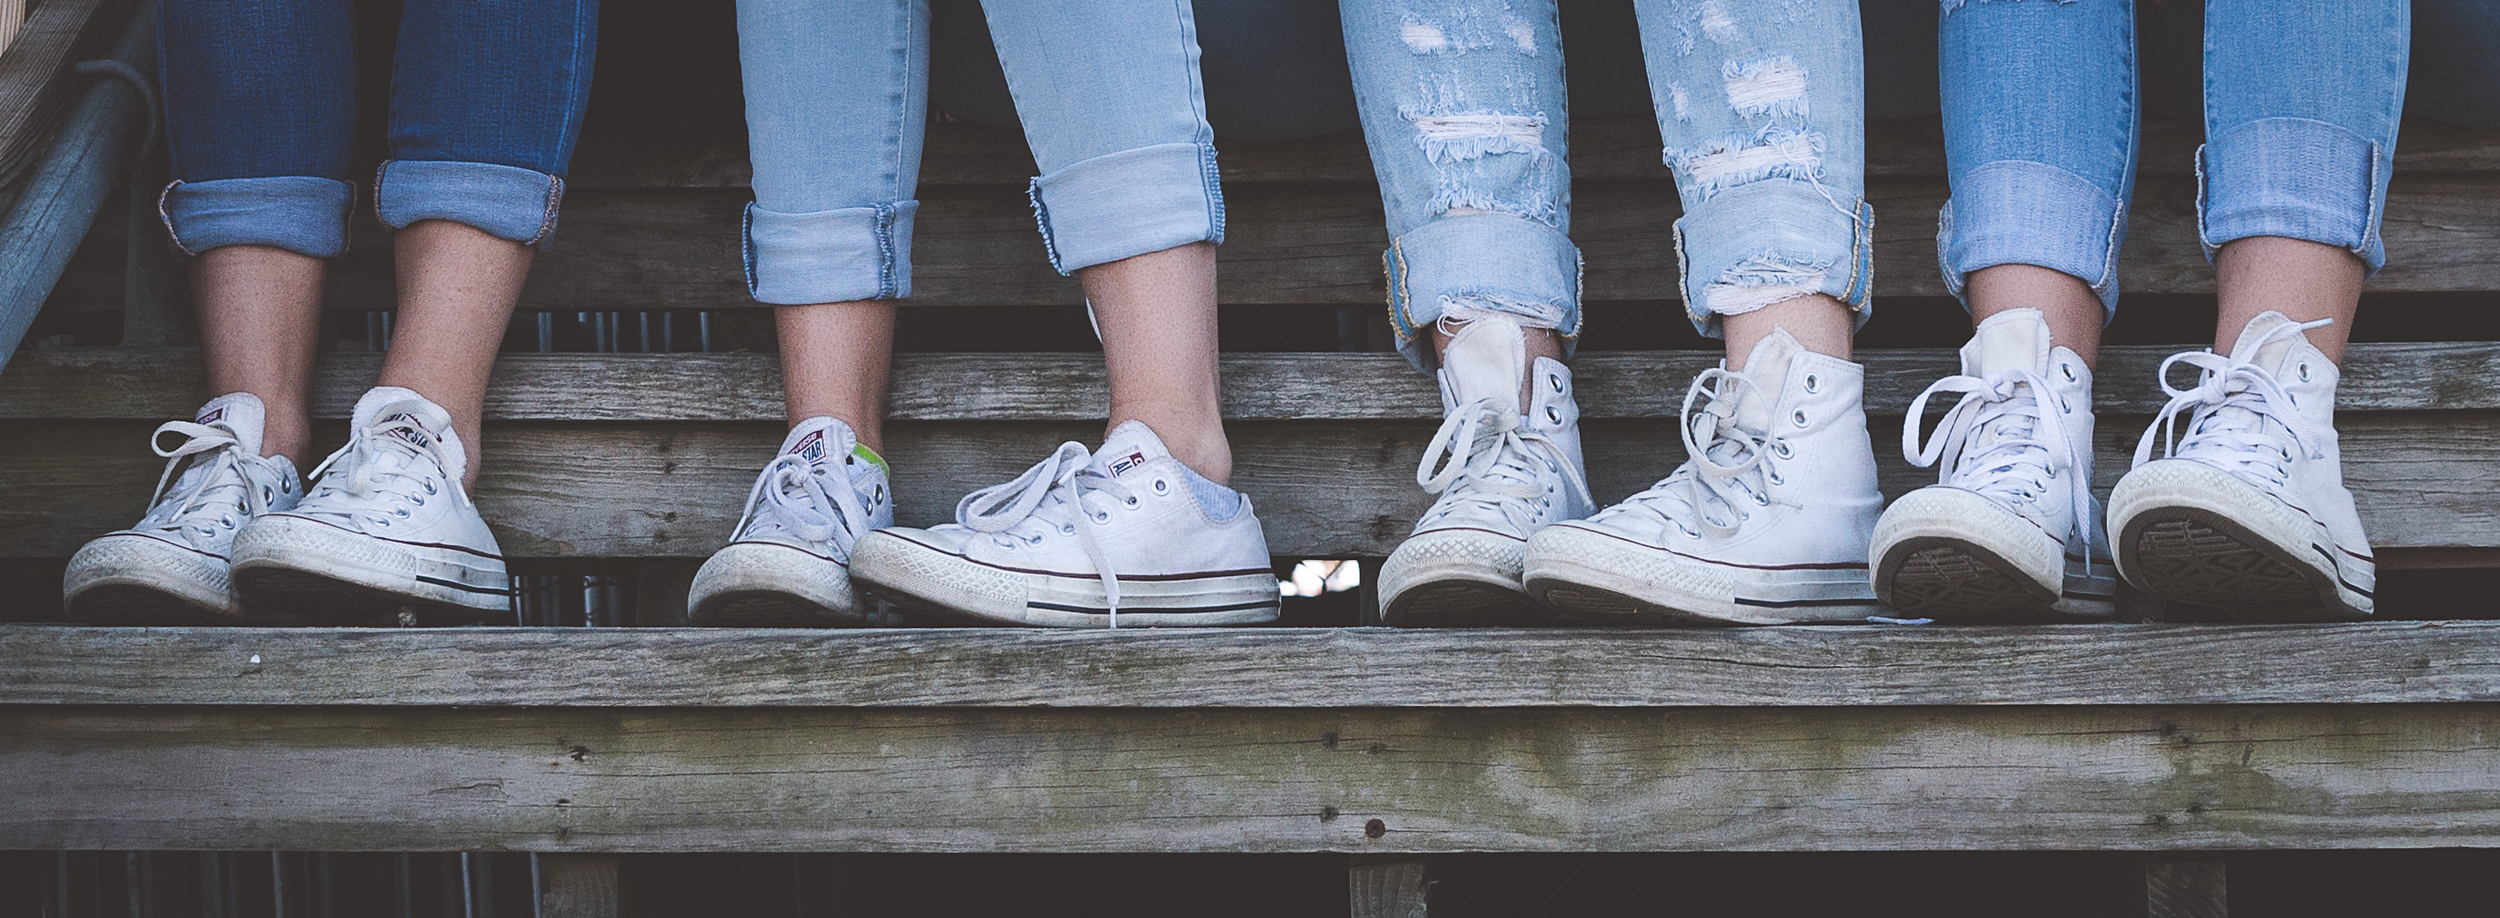 Love the Converse!